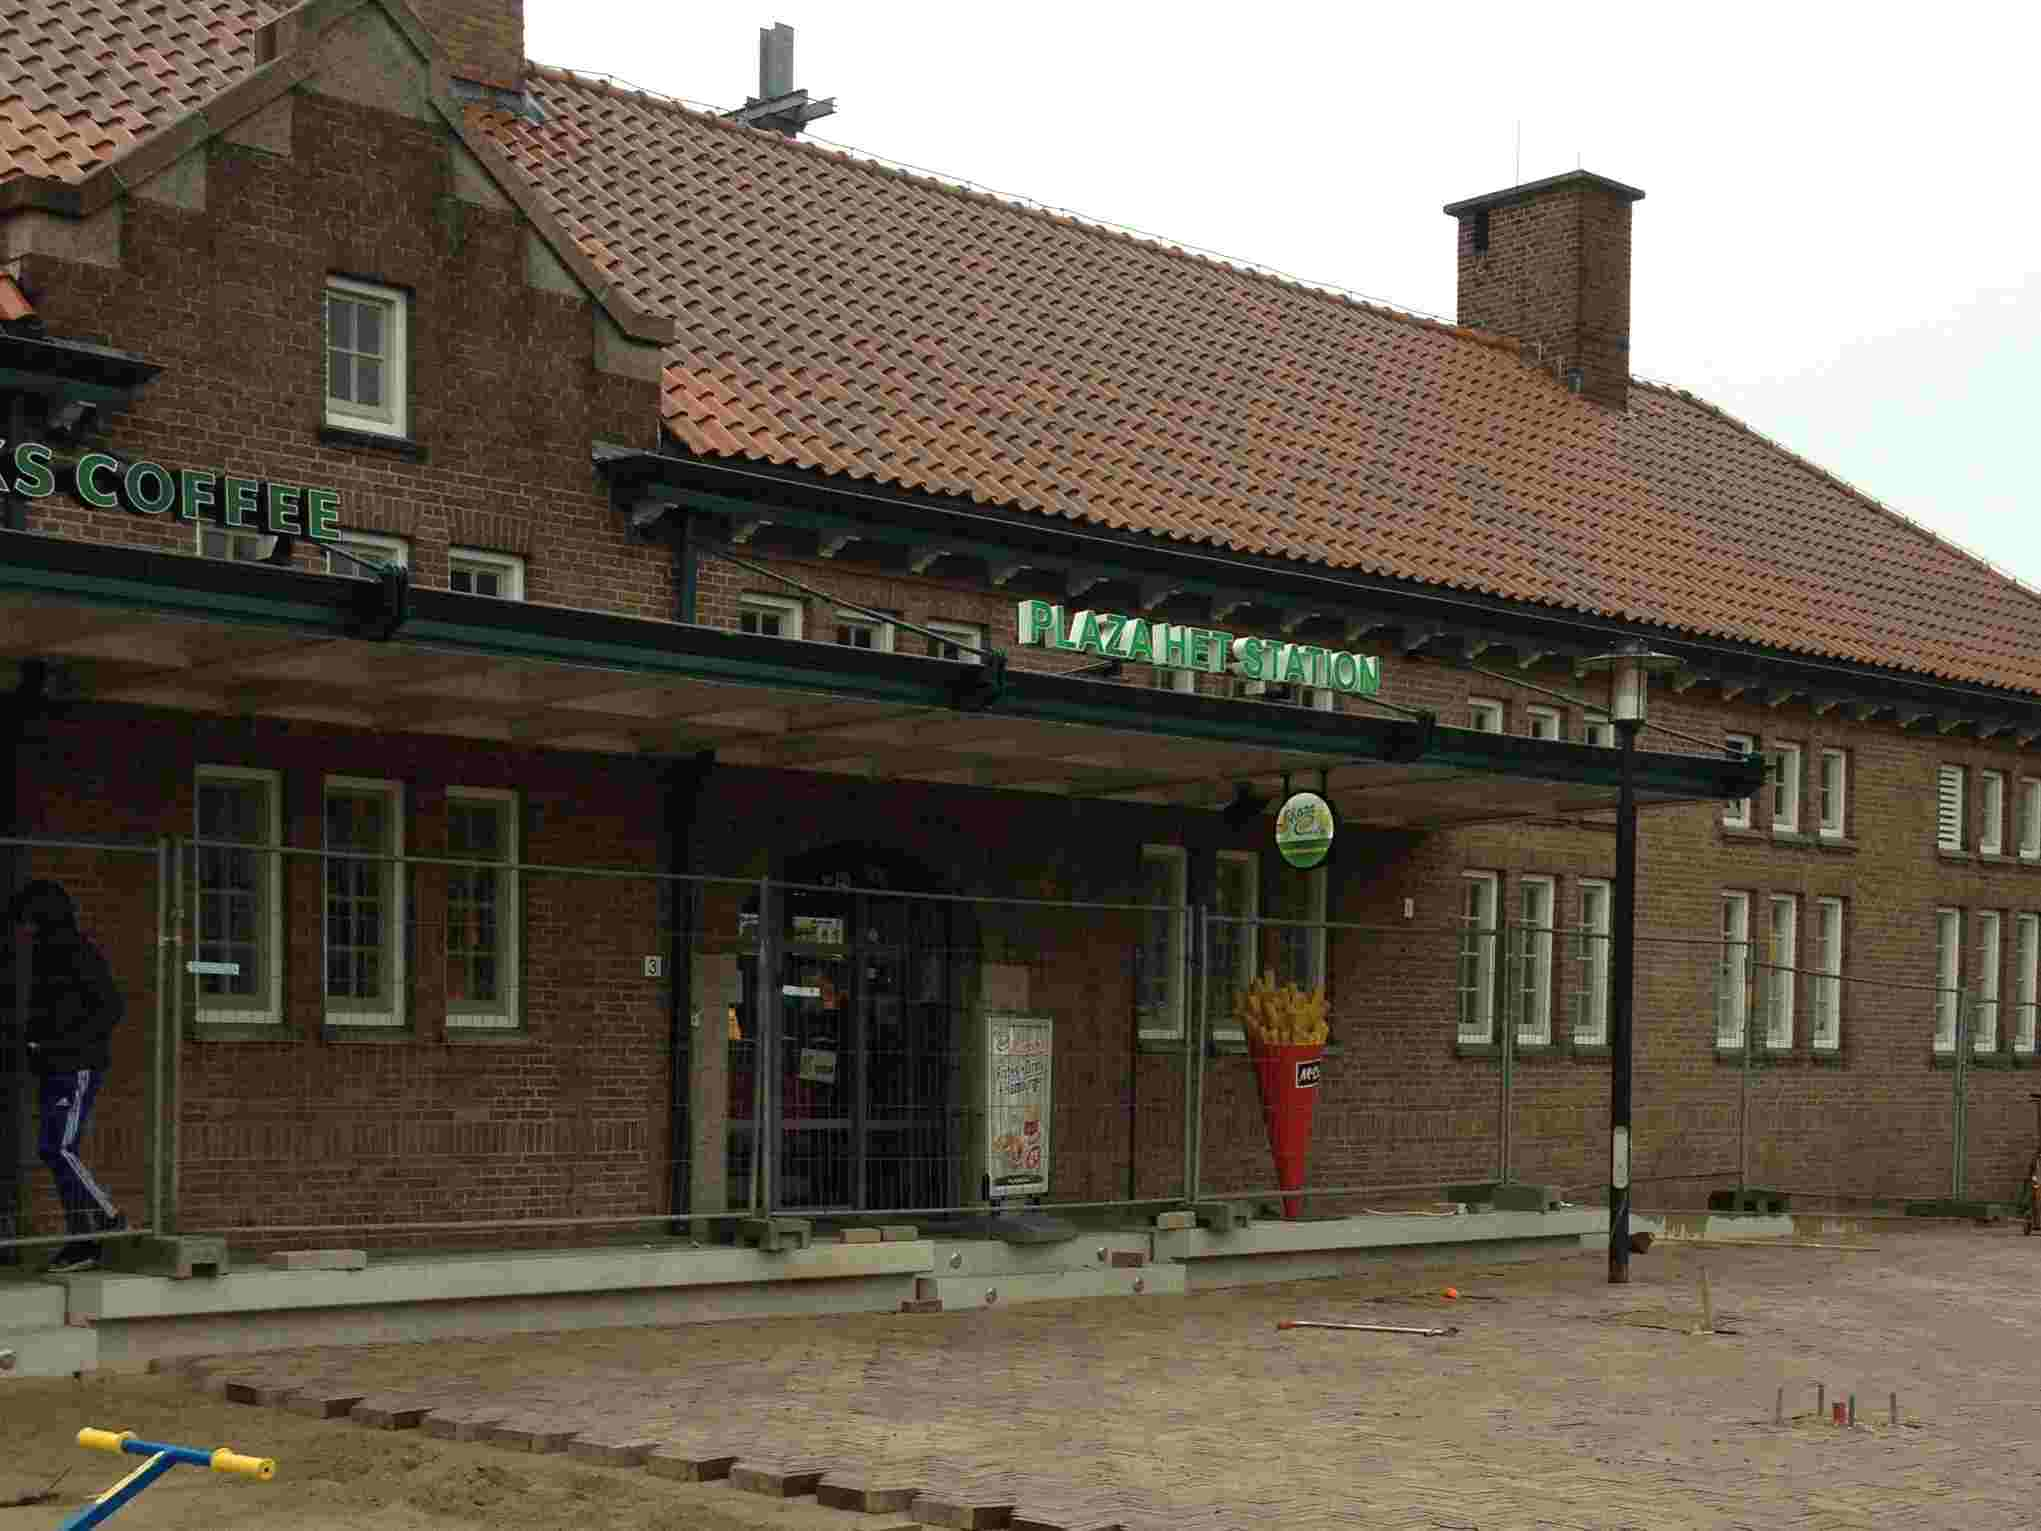 Plaza Het Stationsplein